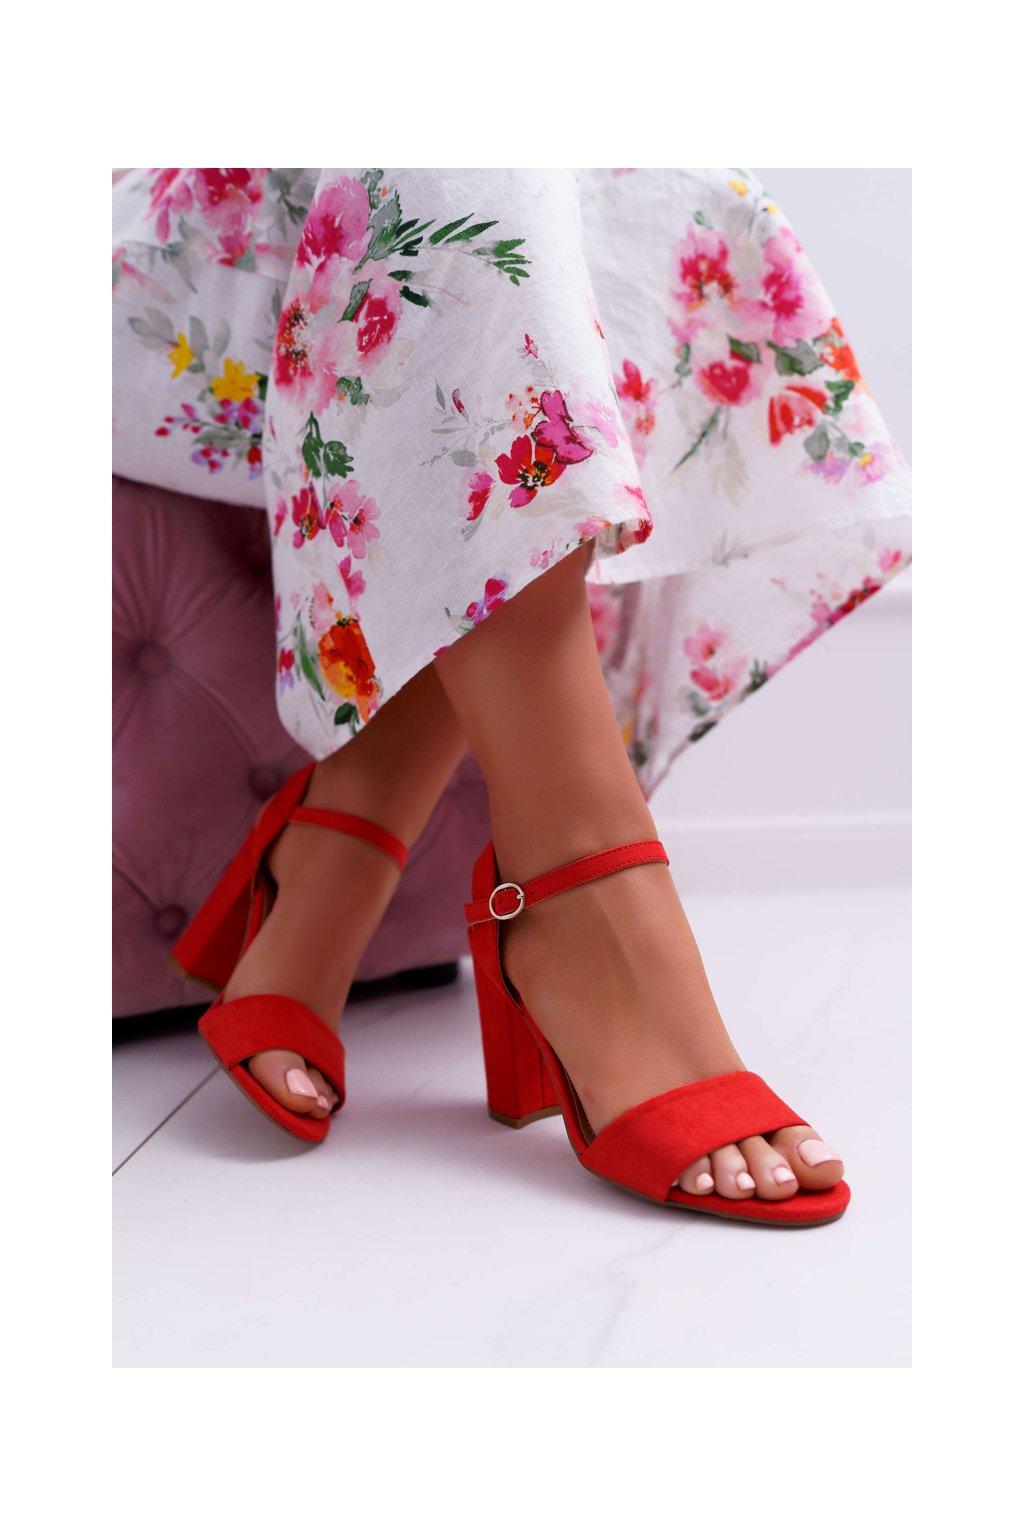 Dámske Sandále semišové Červené Baloo